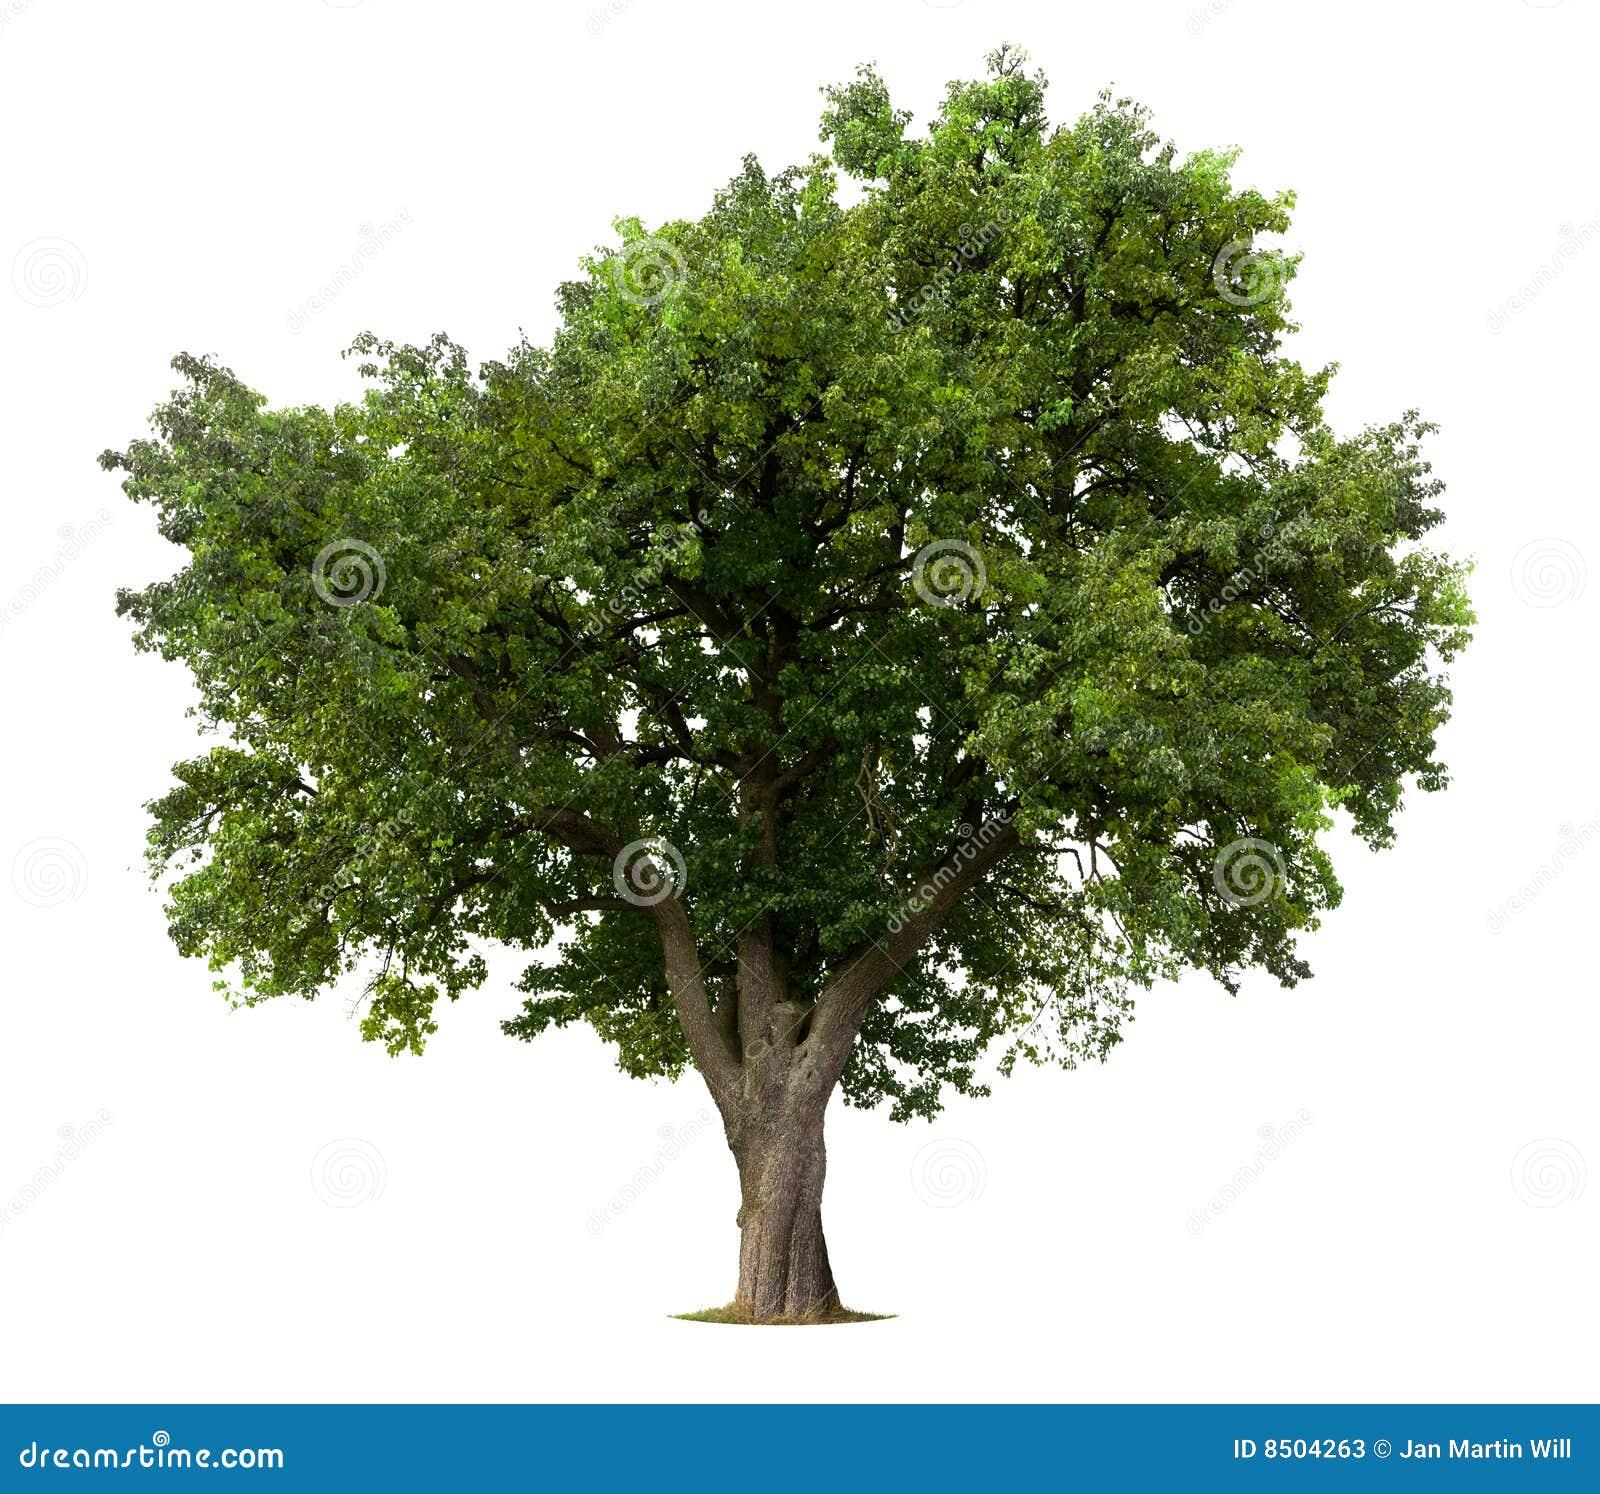 how to cut downan apple tree